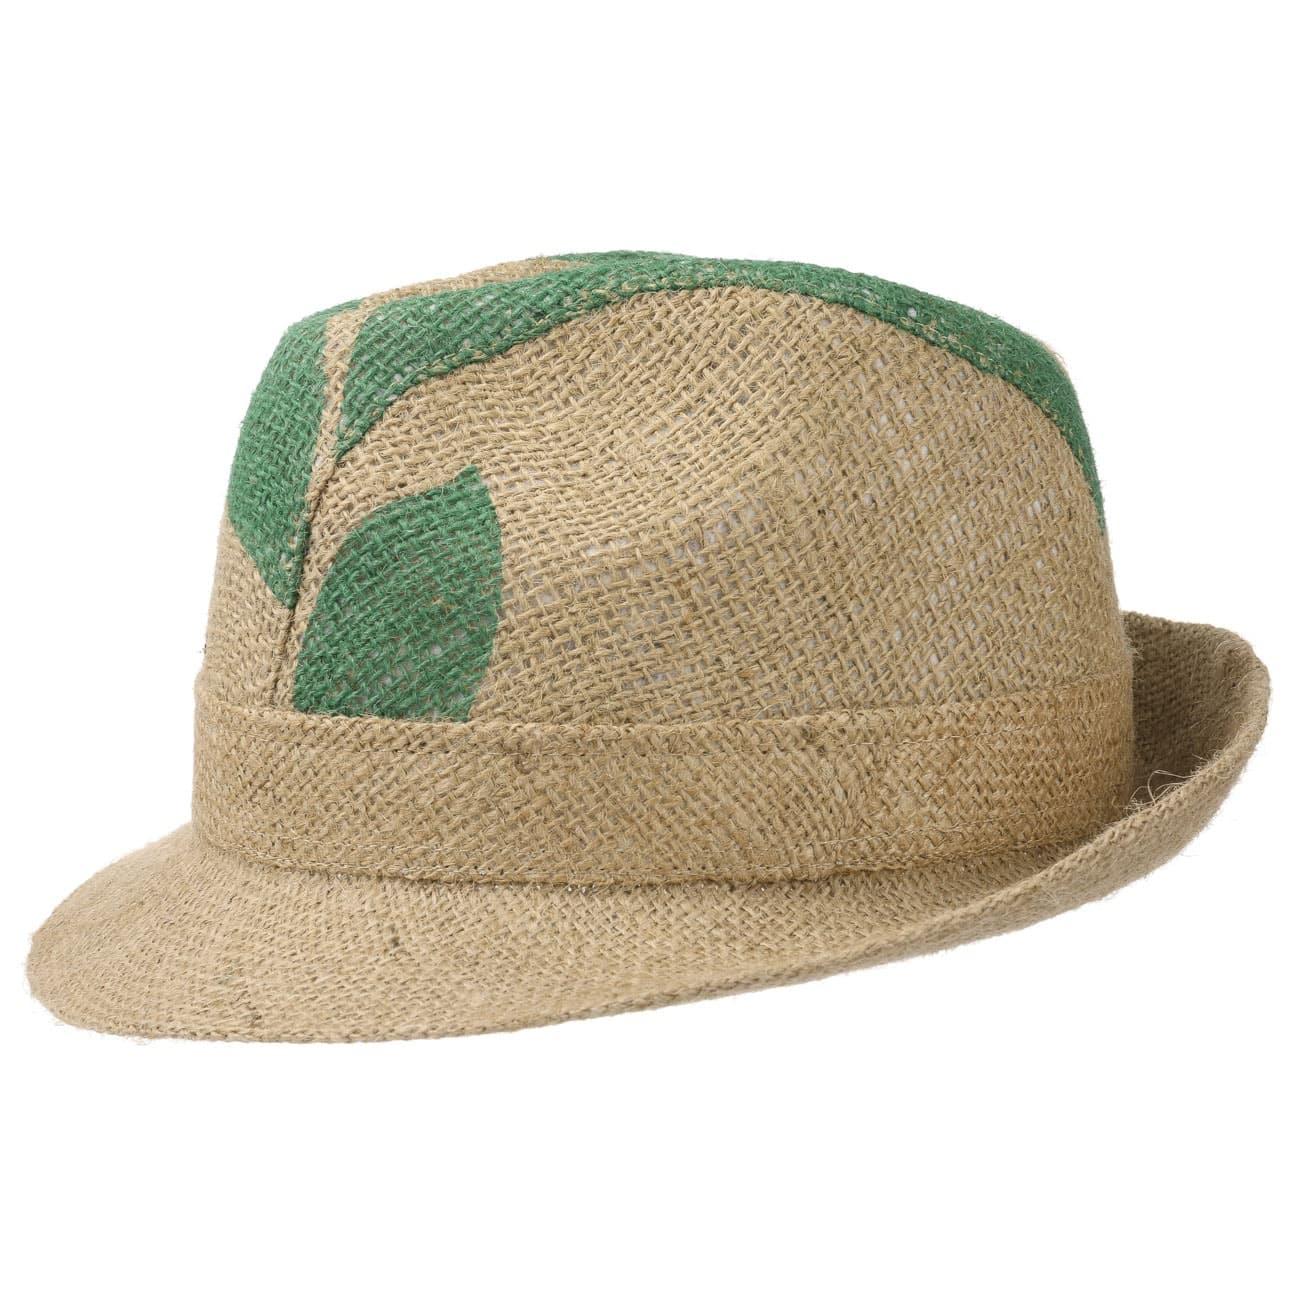 Sombrero Caf? Corretto Trilby by ReHats  sombrero de paja